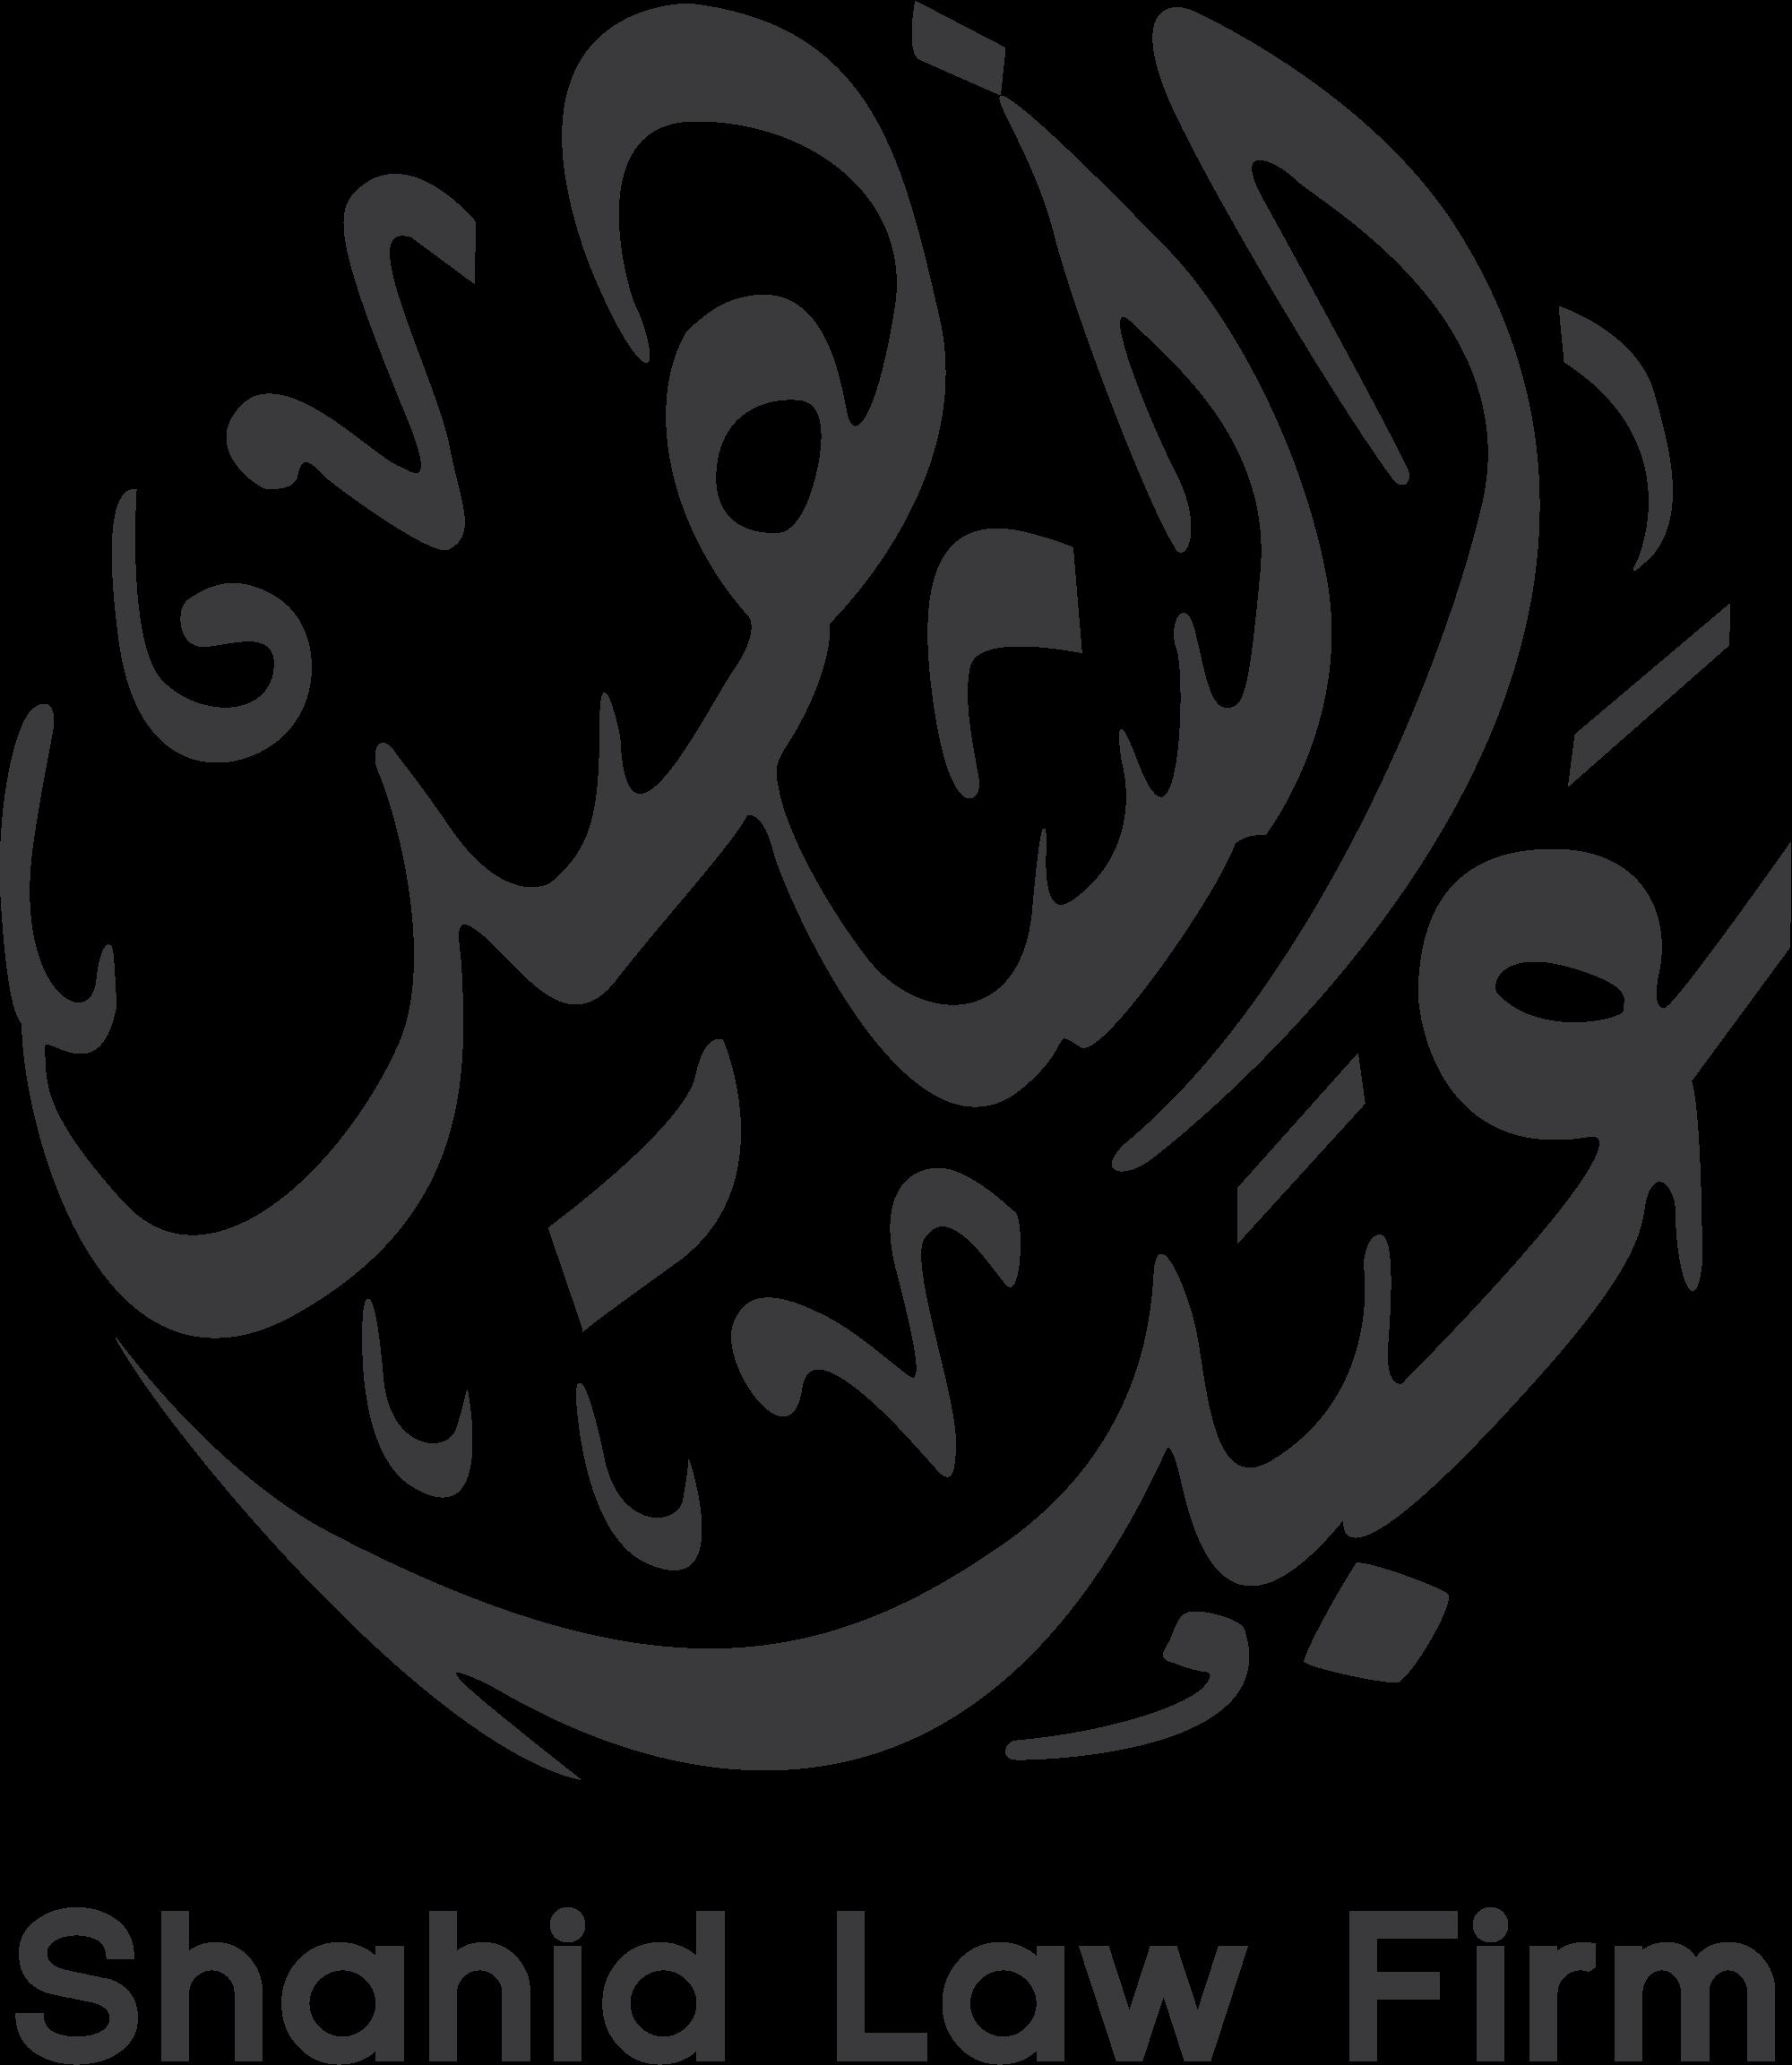 Shahid law firm